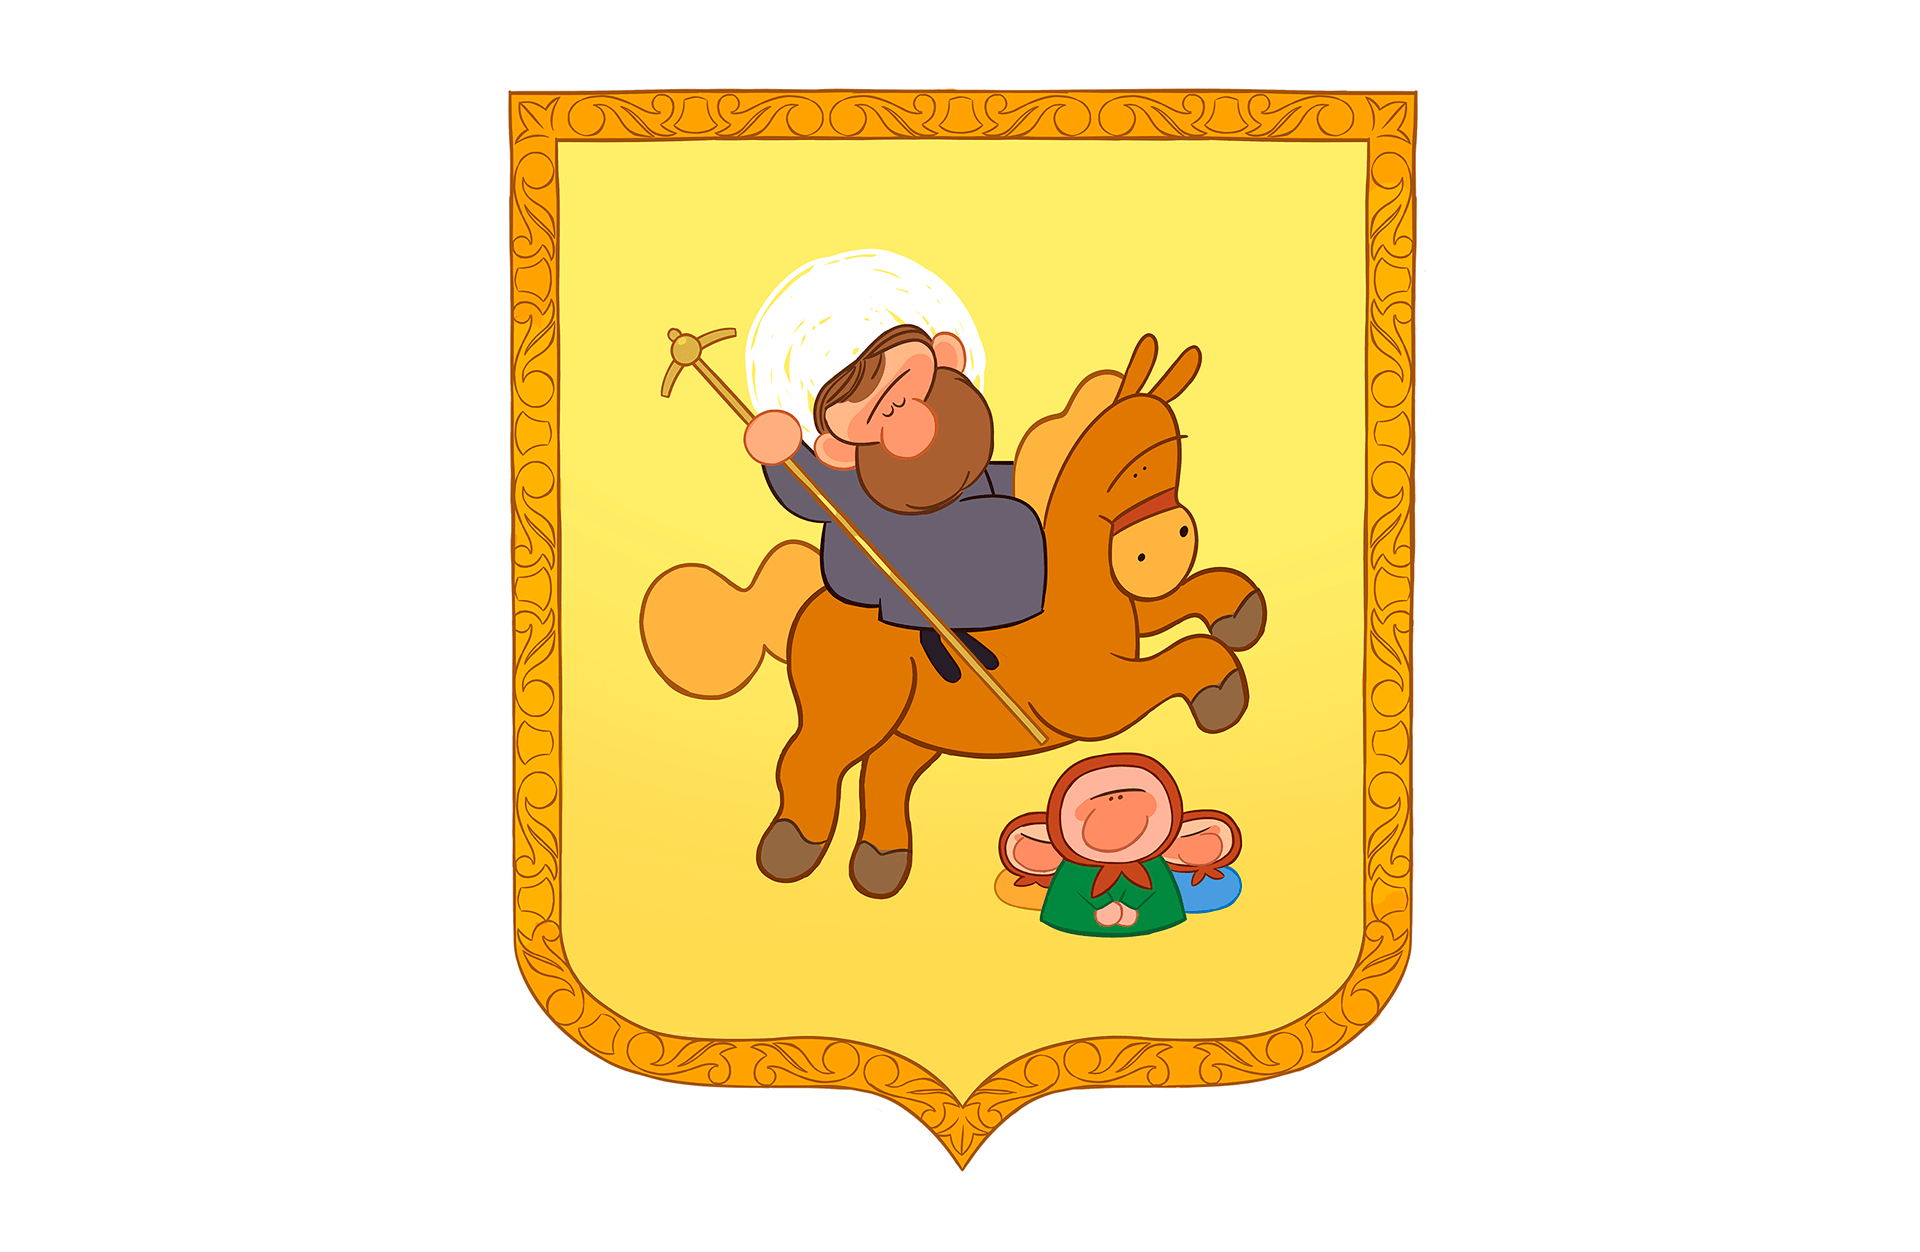 08 - Новый герб Москвы